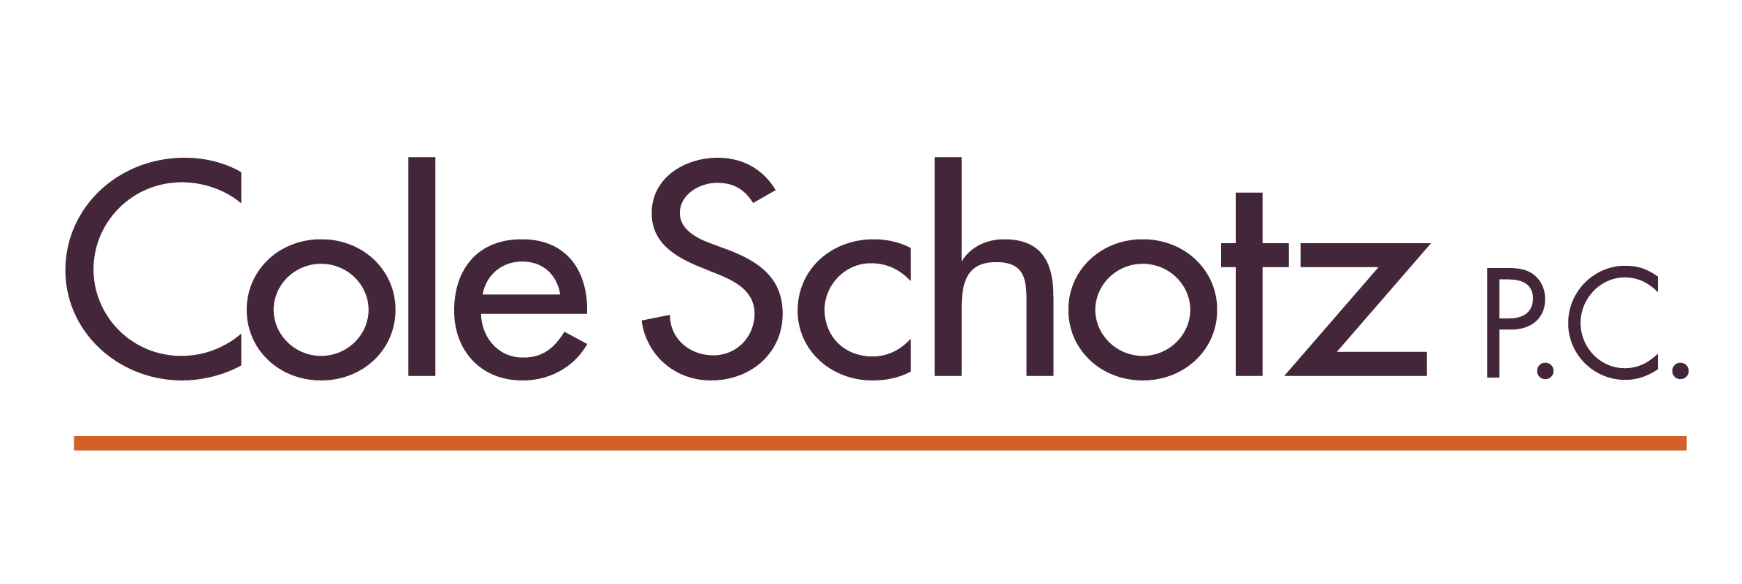 Cole Schotz logo